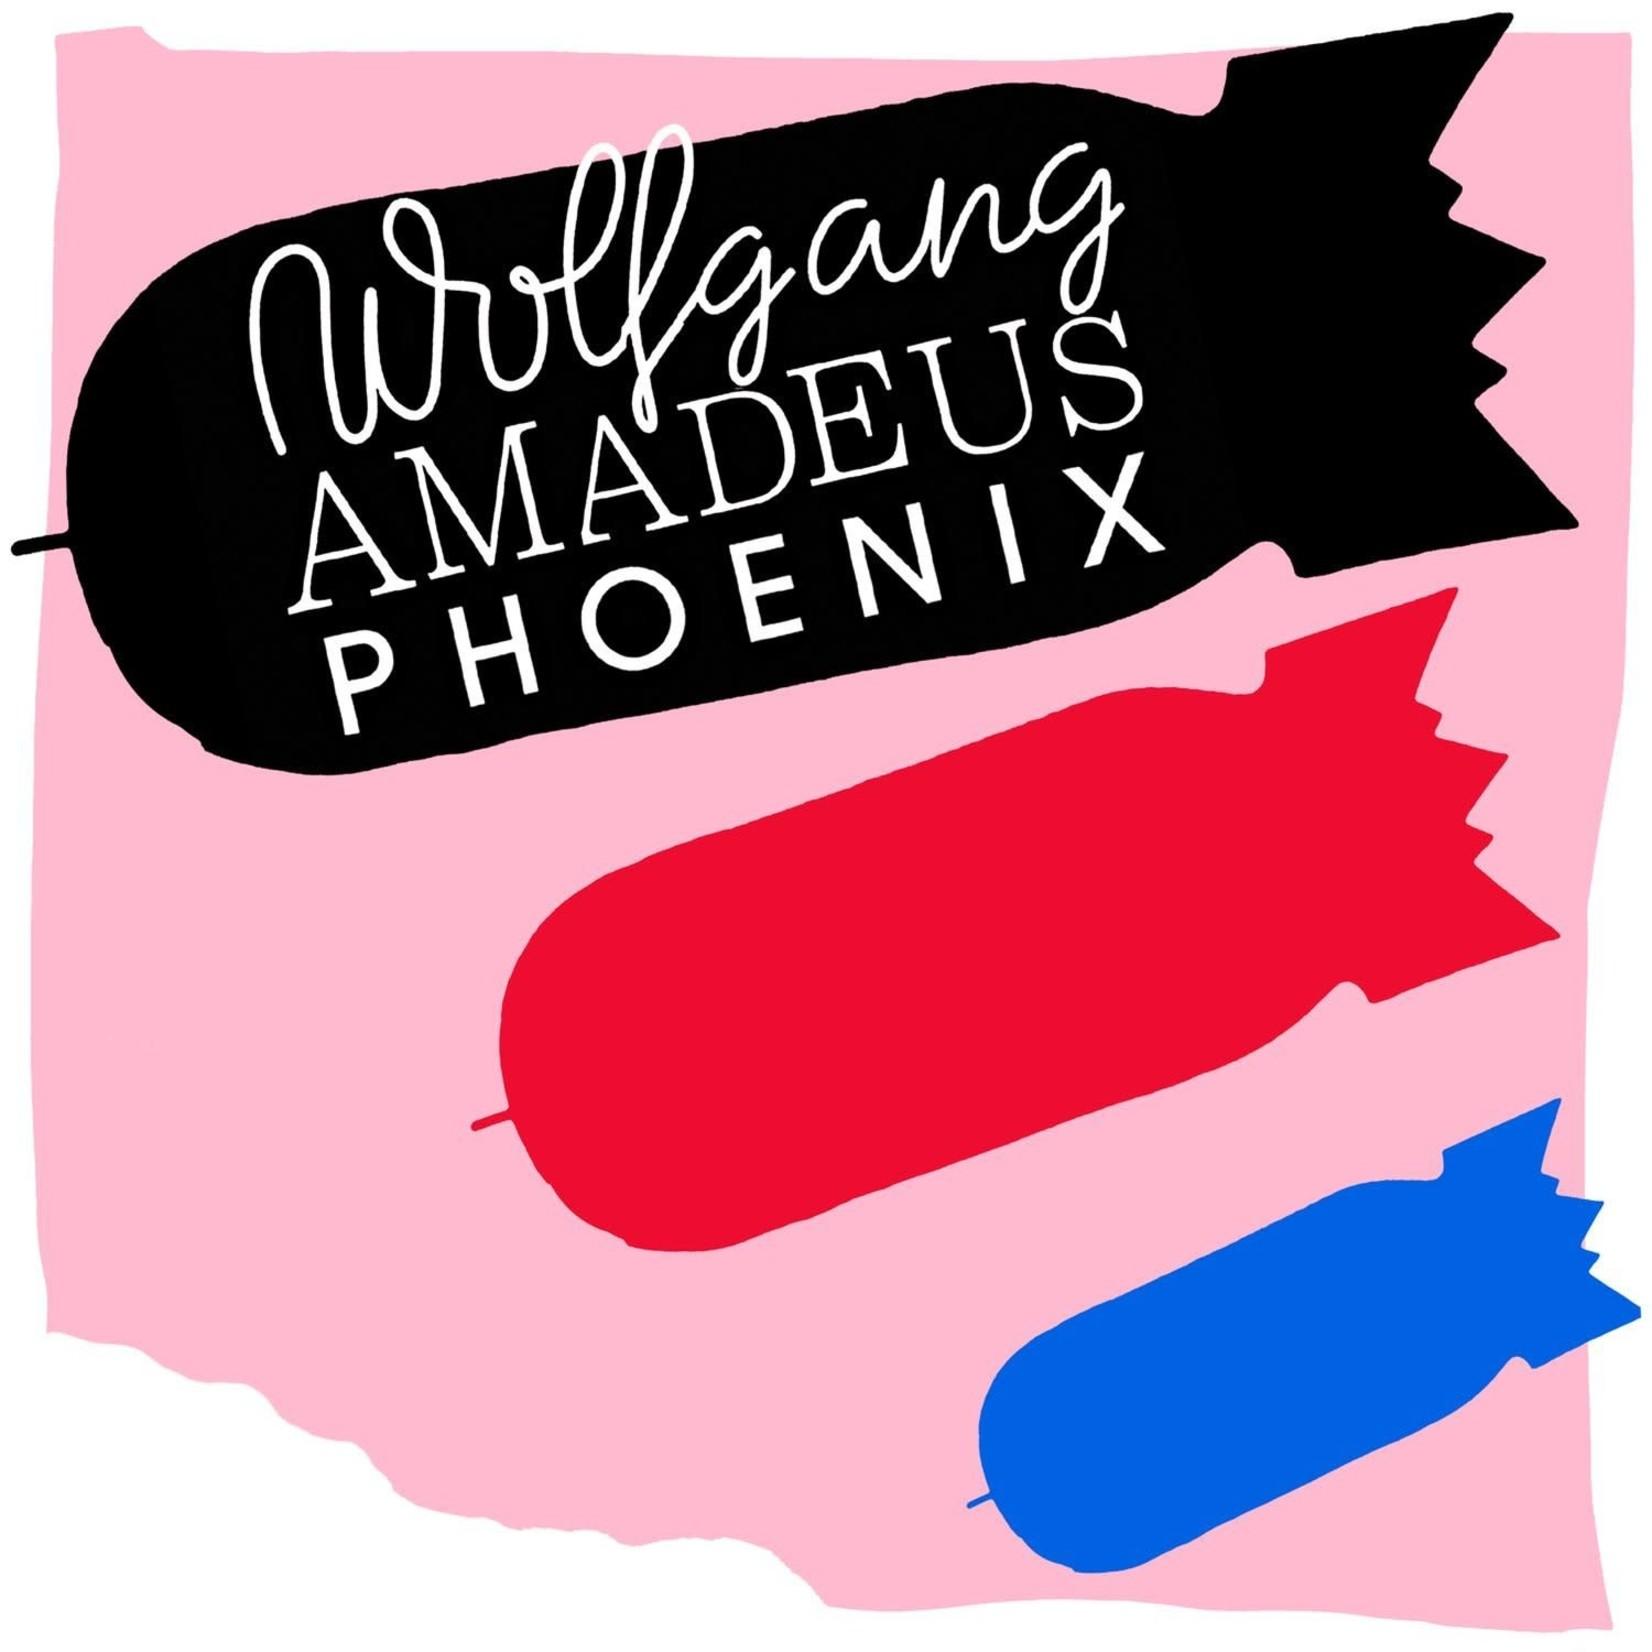 [New] Phoenix: Wolfgang Amadeus Phoenix